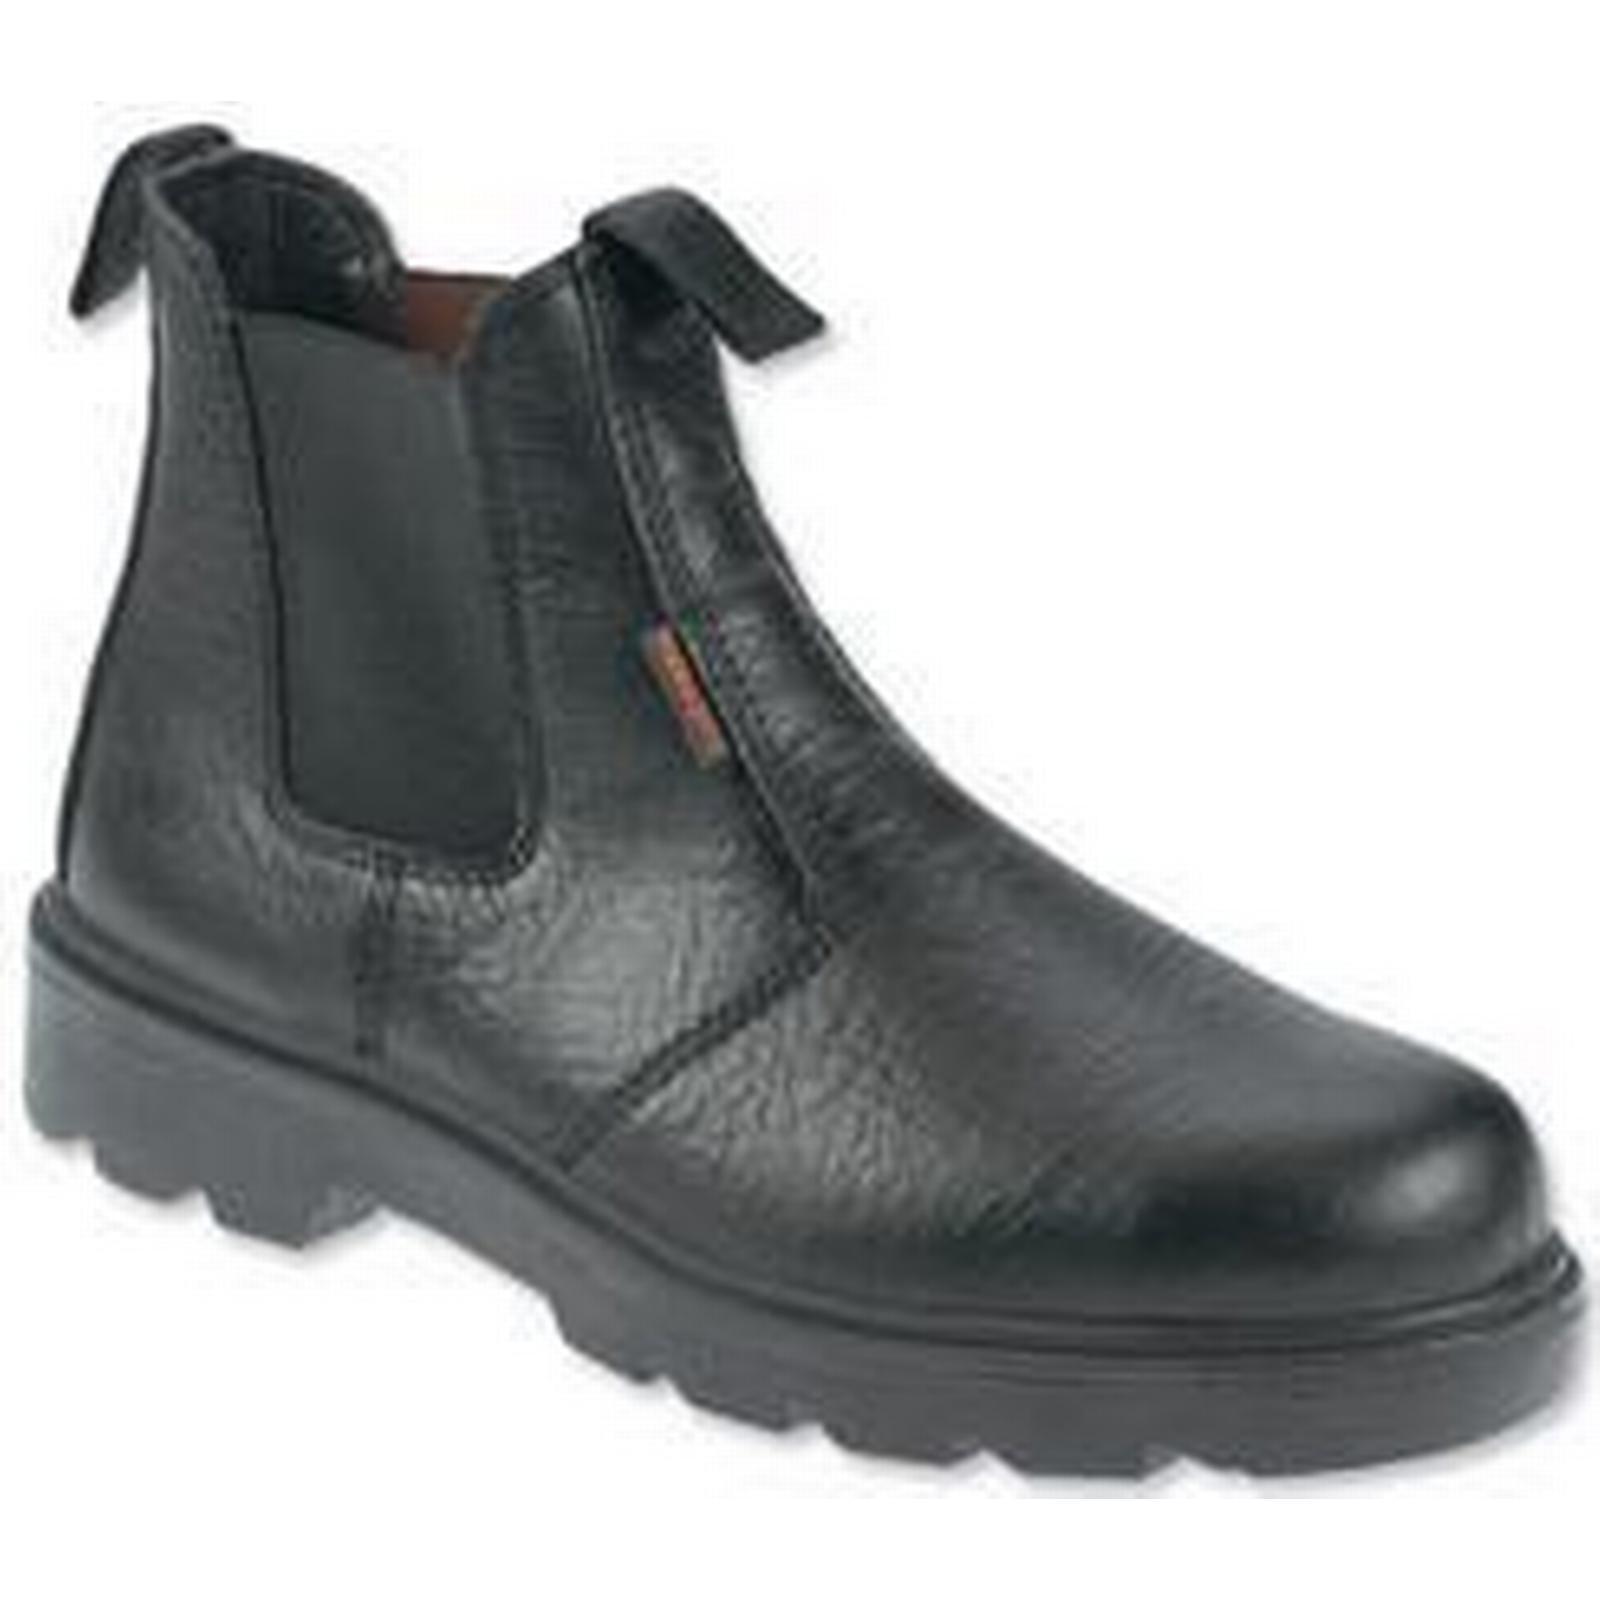 Sterling & Work Site Dealer Boots Steel-toe Cap & Sterling Midsole - SS600SM 7 46f758